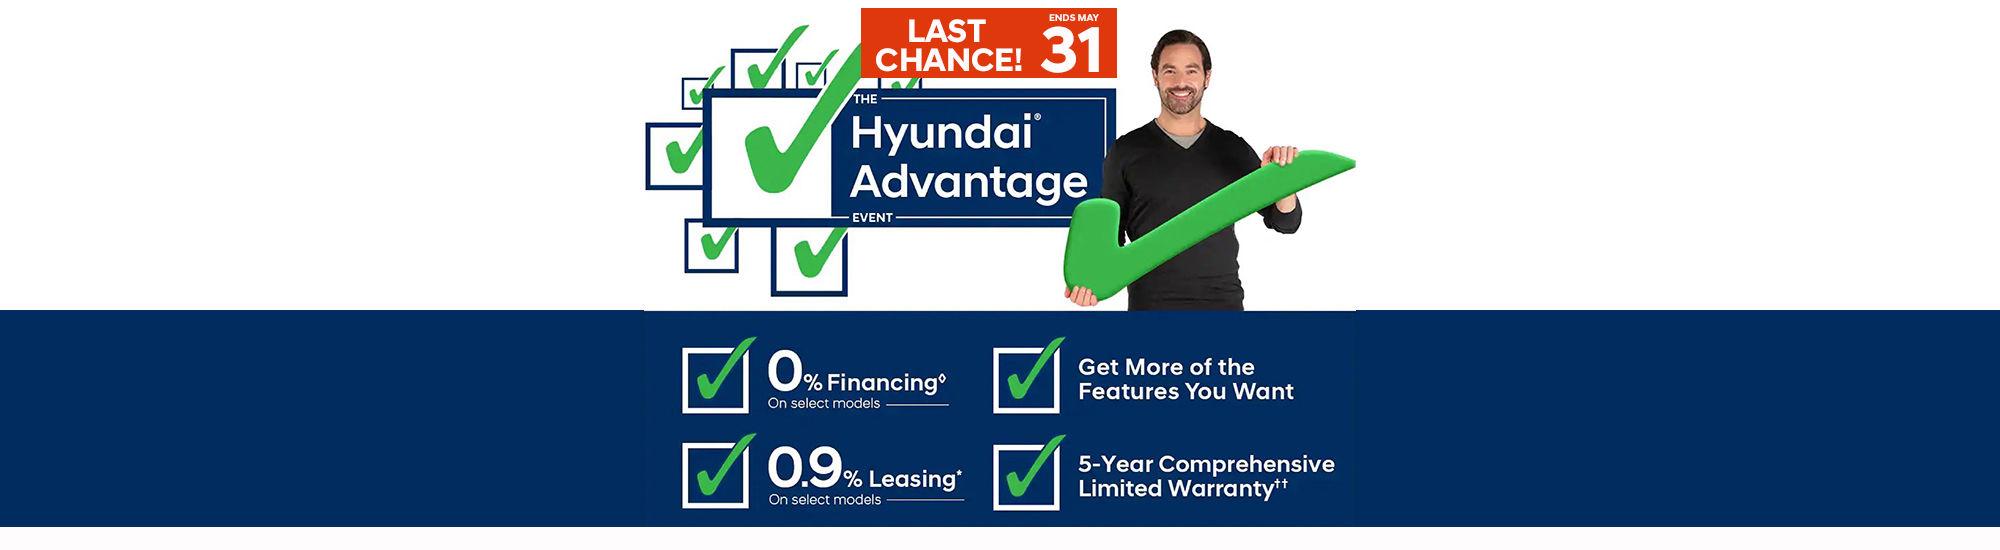 Hyundai advantage Event